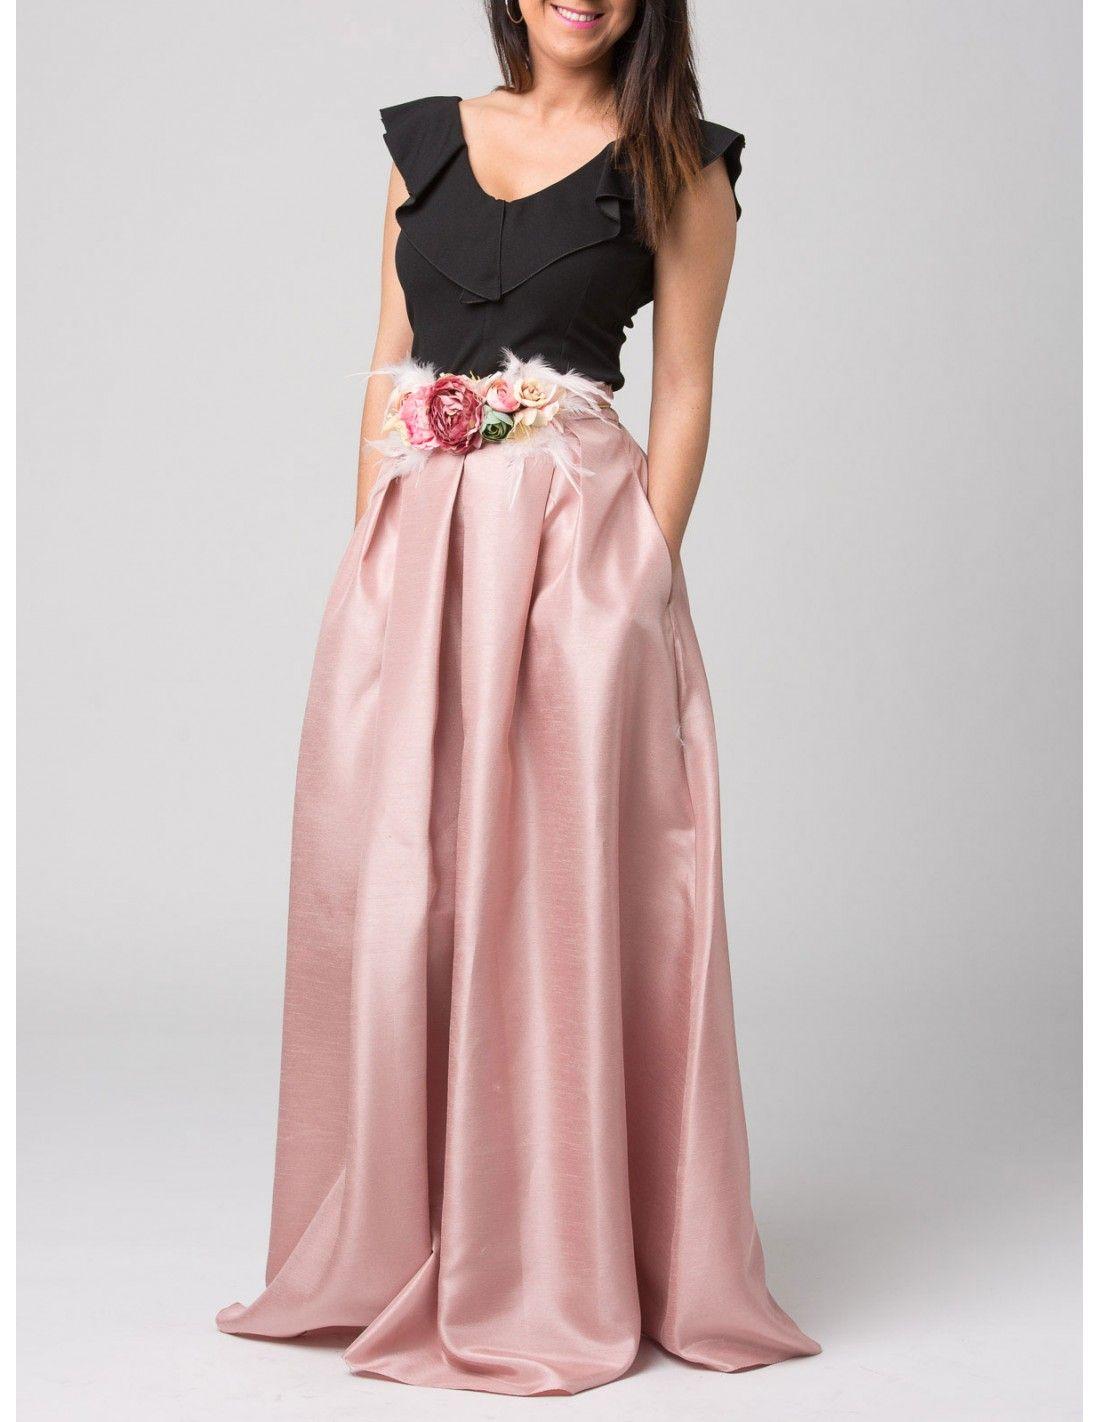 abf73ac8a Falda Zaida - Falda larga de tafetán en color rosa. Bolsillos ...